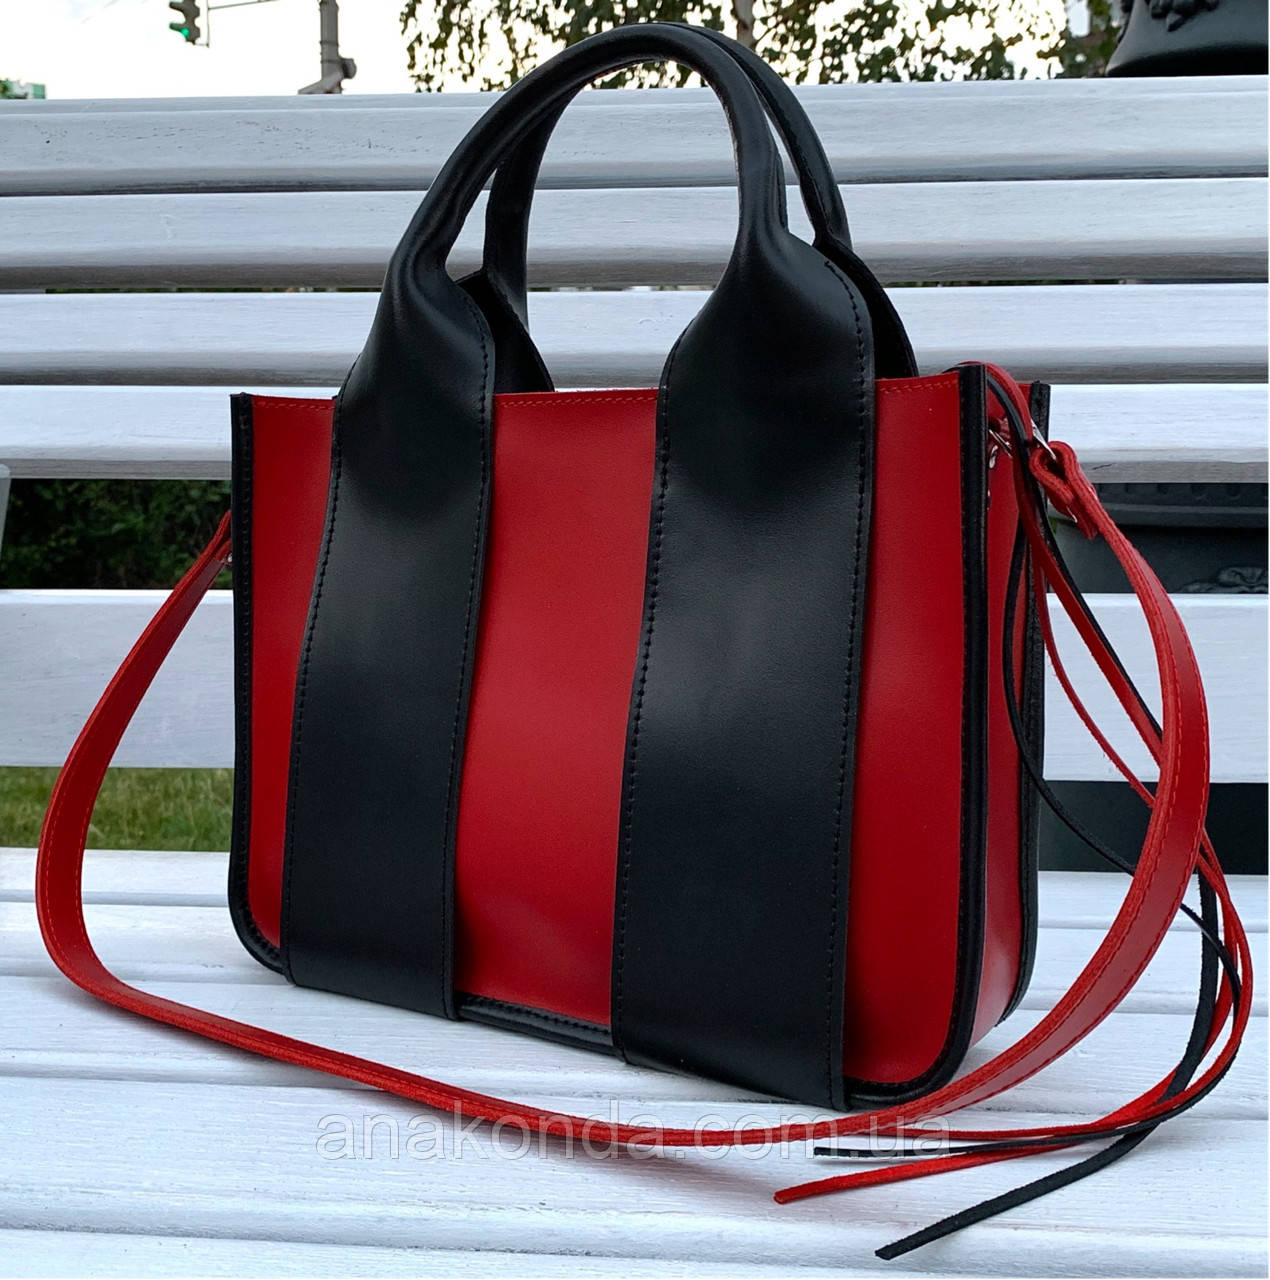 684-1-XL Натуральная кожа Сумка женская красная кожаная черная женская сумка из натуральной кожи А4 формат